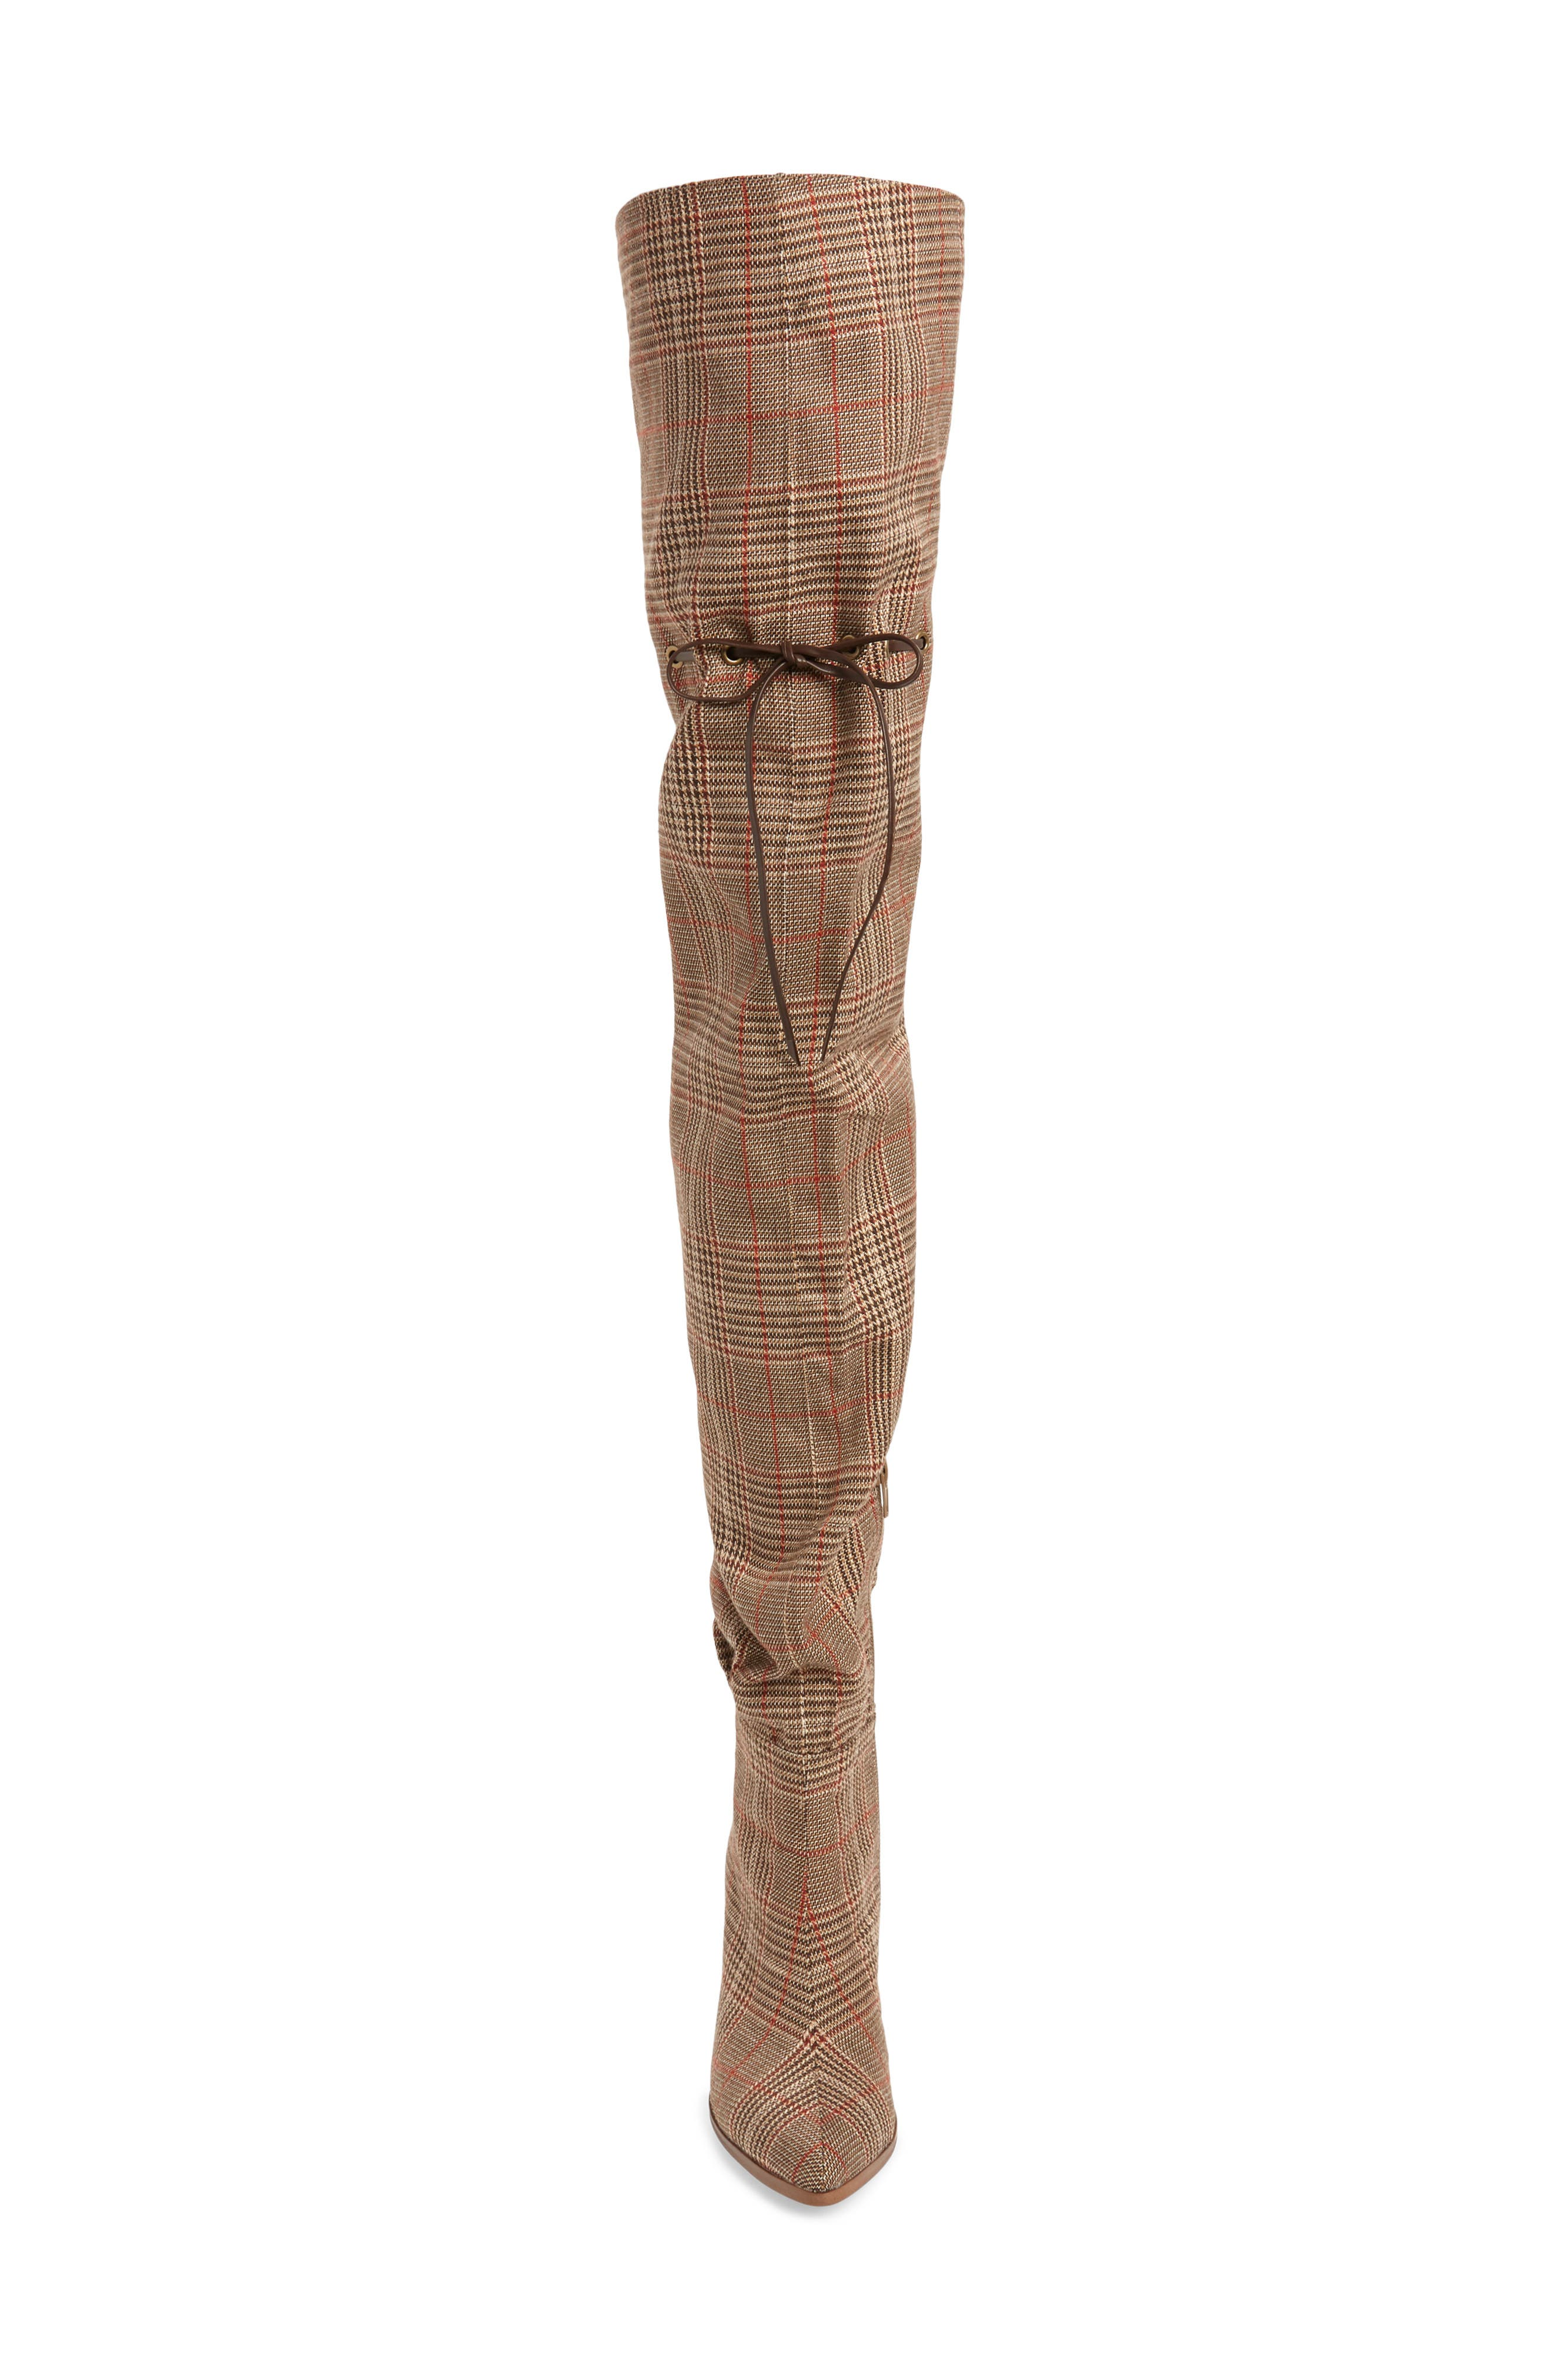 Go-Go-Girl Thigh High Boot,                             Alternate thumbnail 4, color,                             BEIGE PLAID